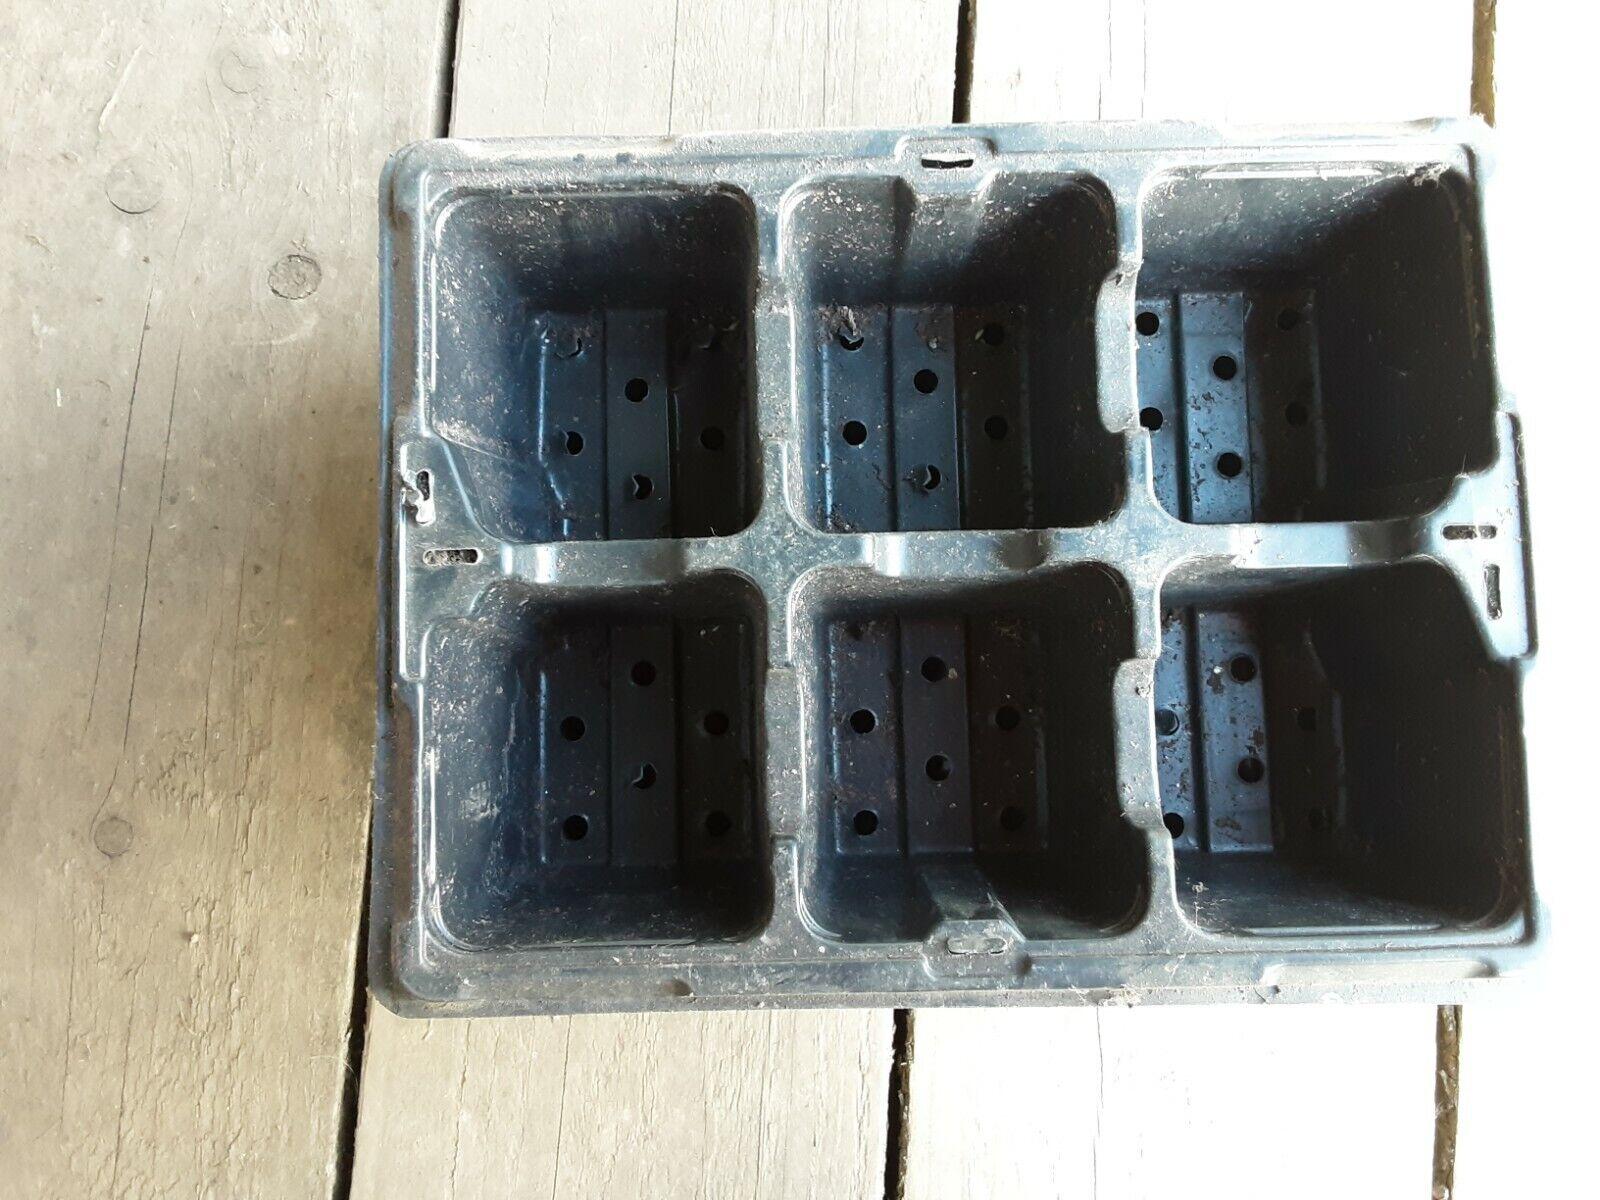 10 Black Plastics Cell Potting Trays